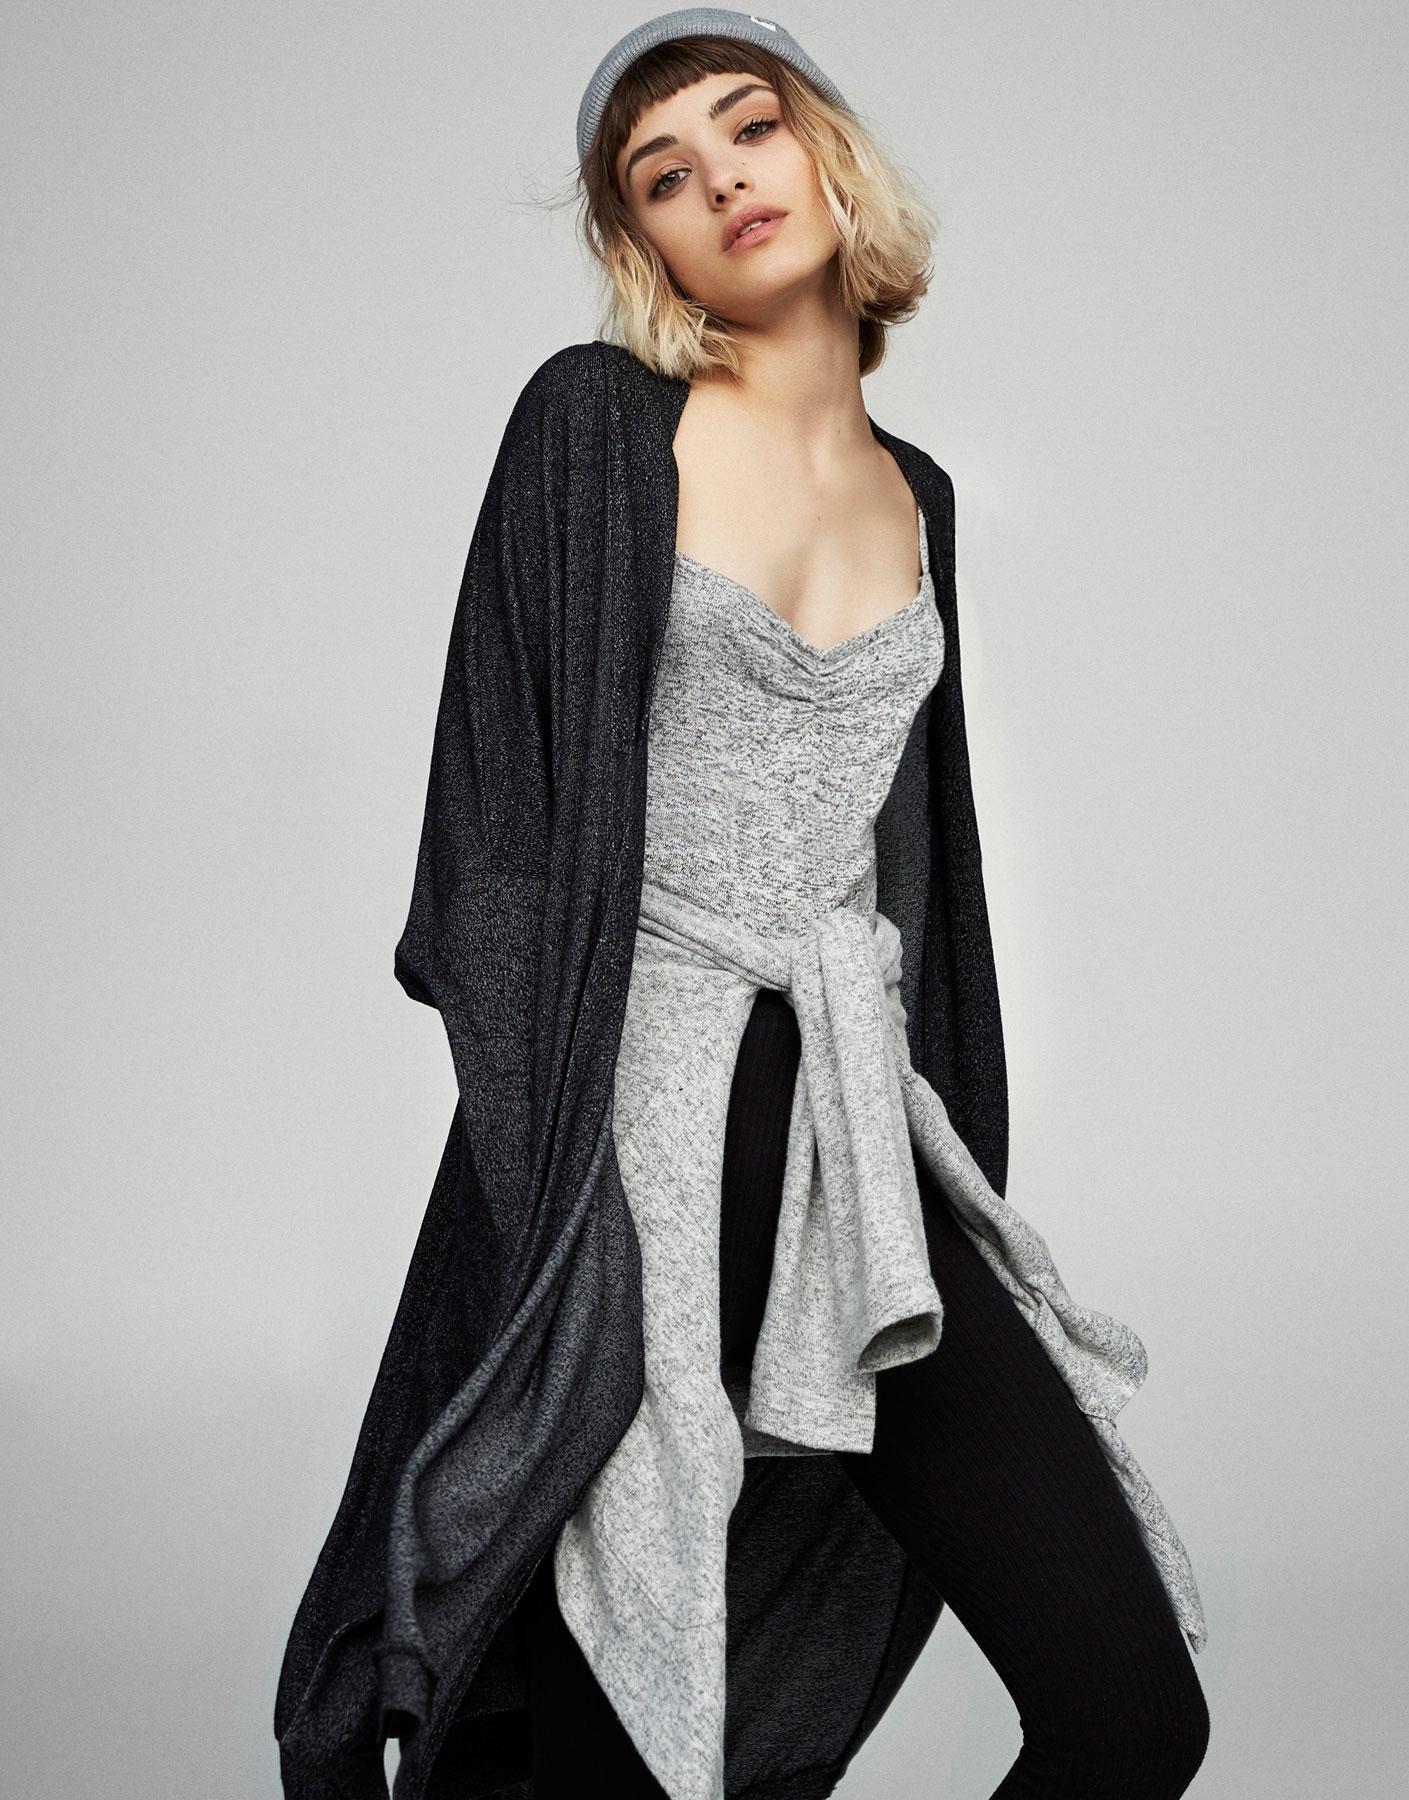 Oversized cardigan with side slits